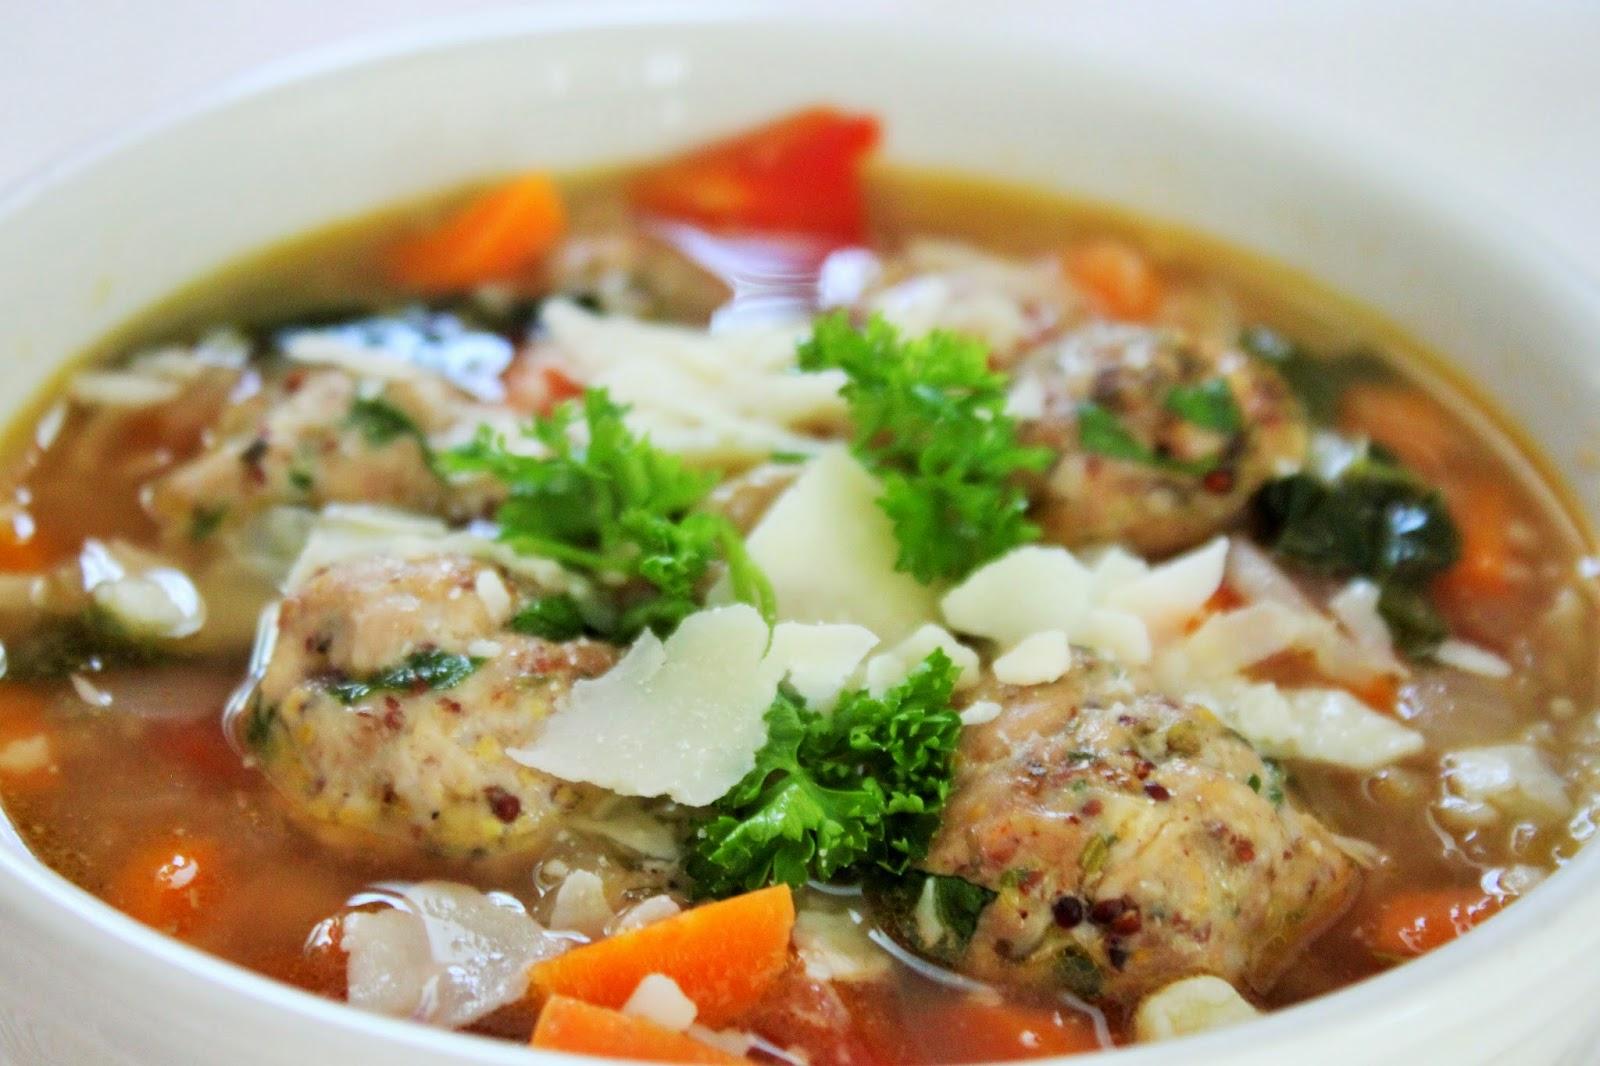 Turkey Meatball Italian Wedding Soup With Cauliflower Orzo Being